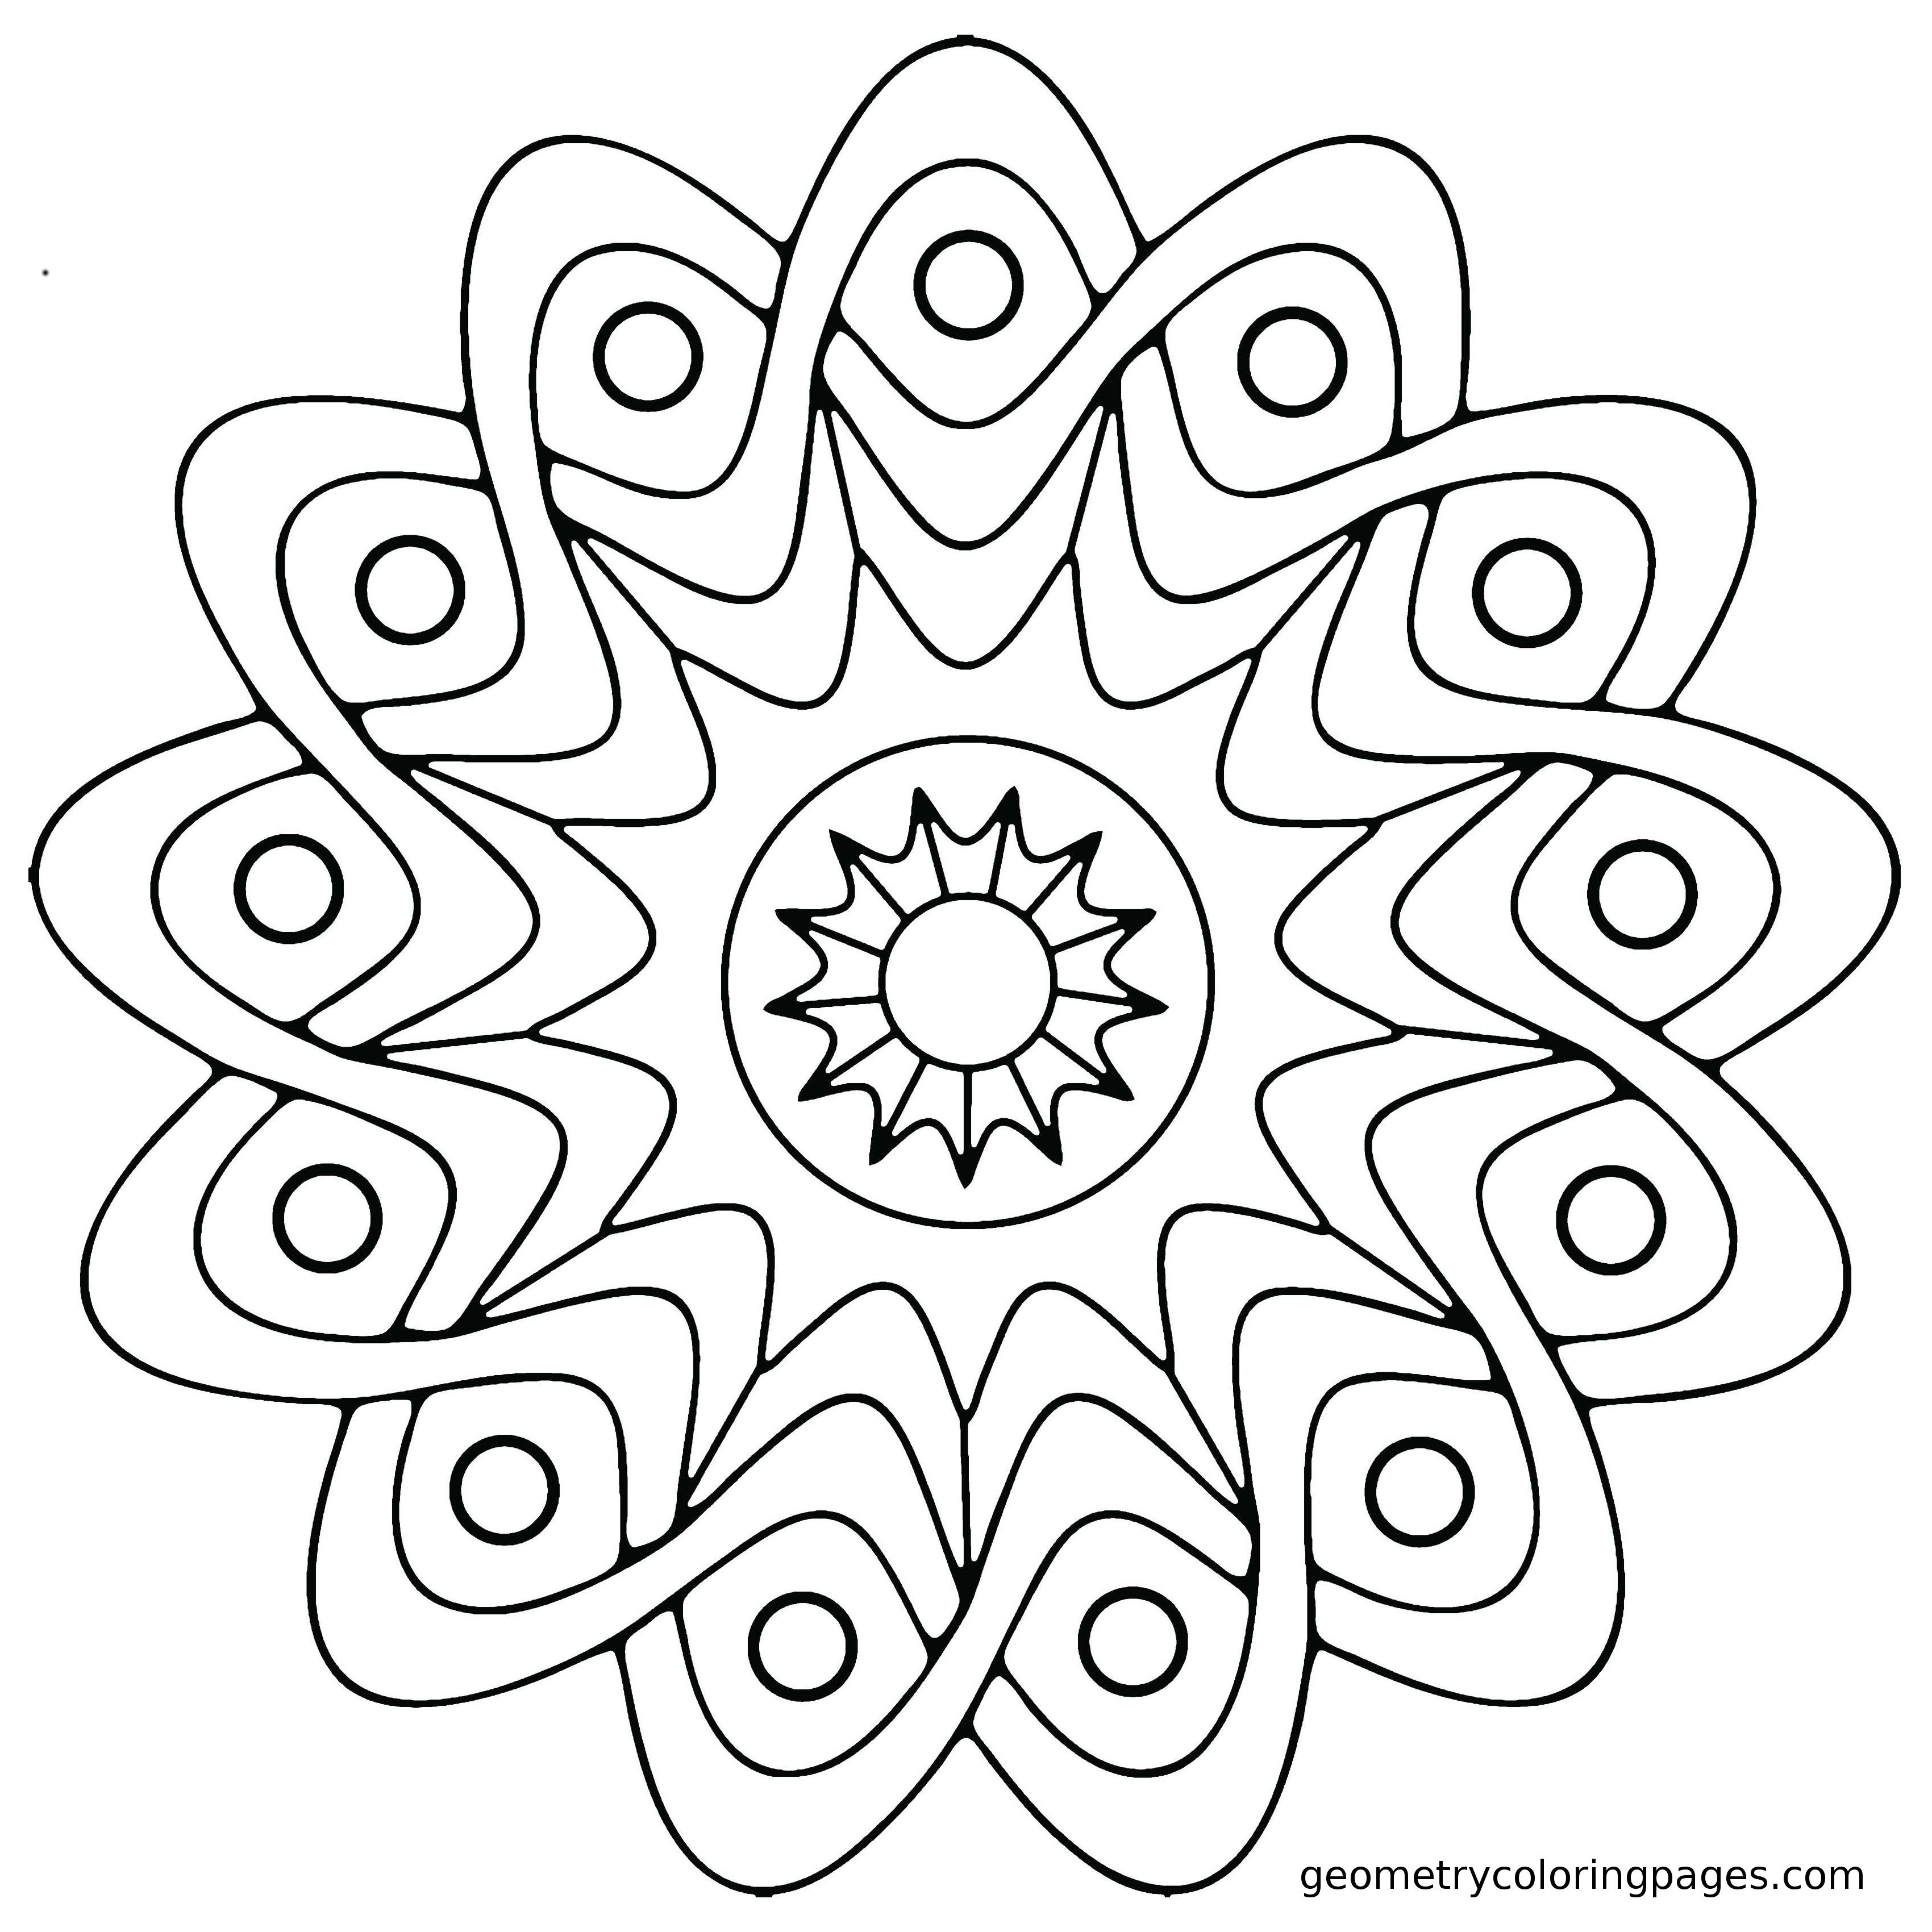 Mandala Coloring Pages Easy Mandala Coloring Pages